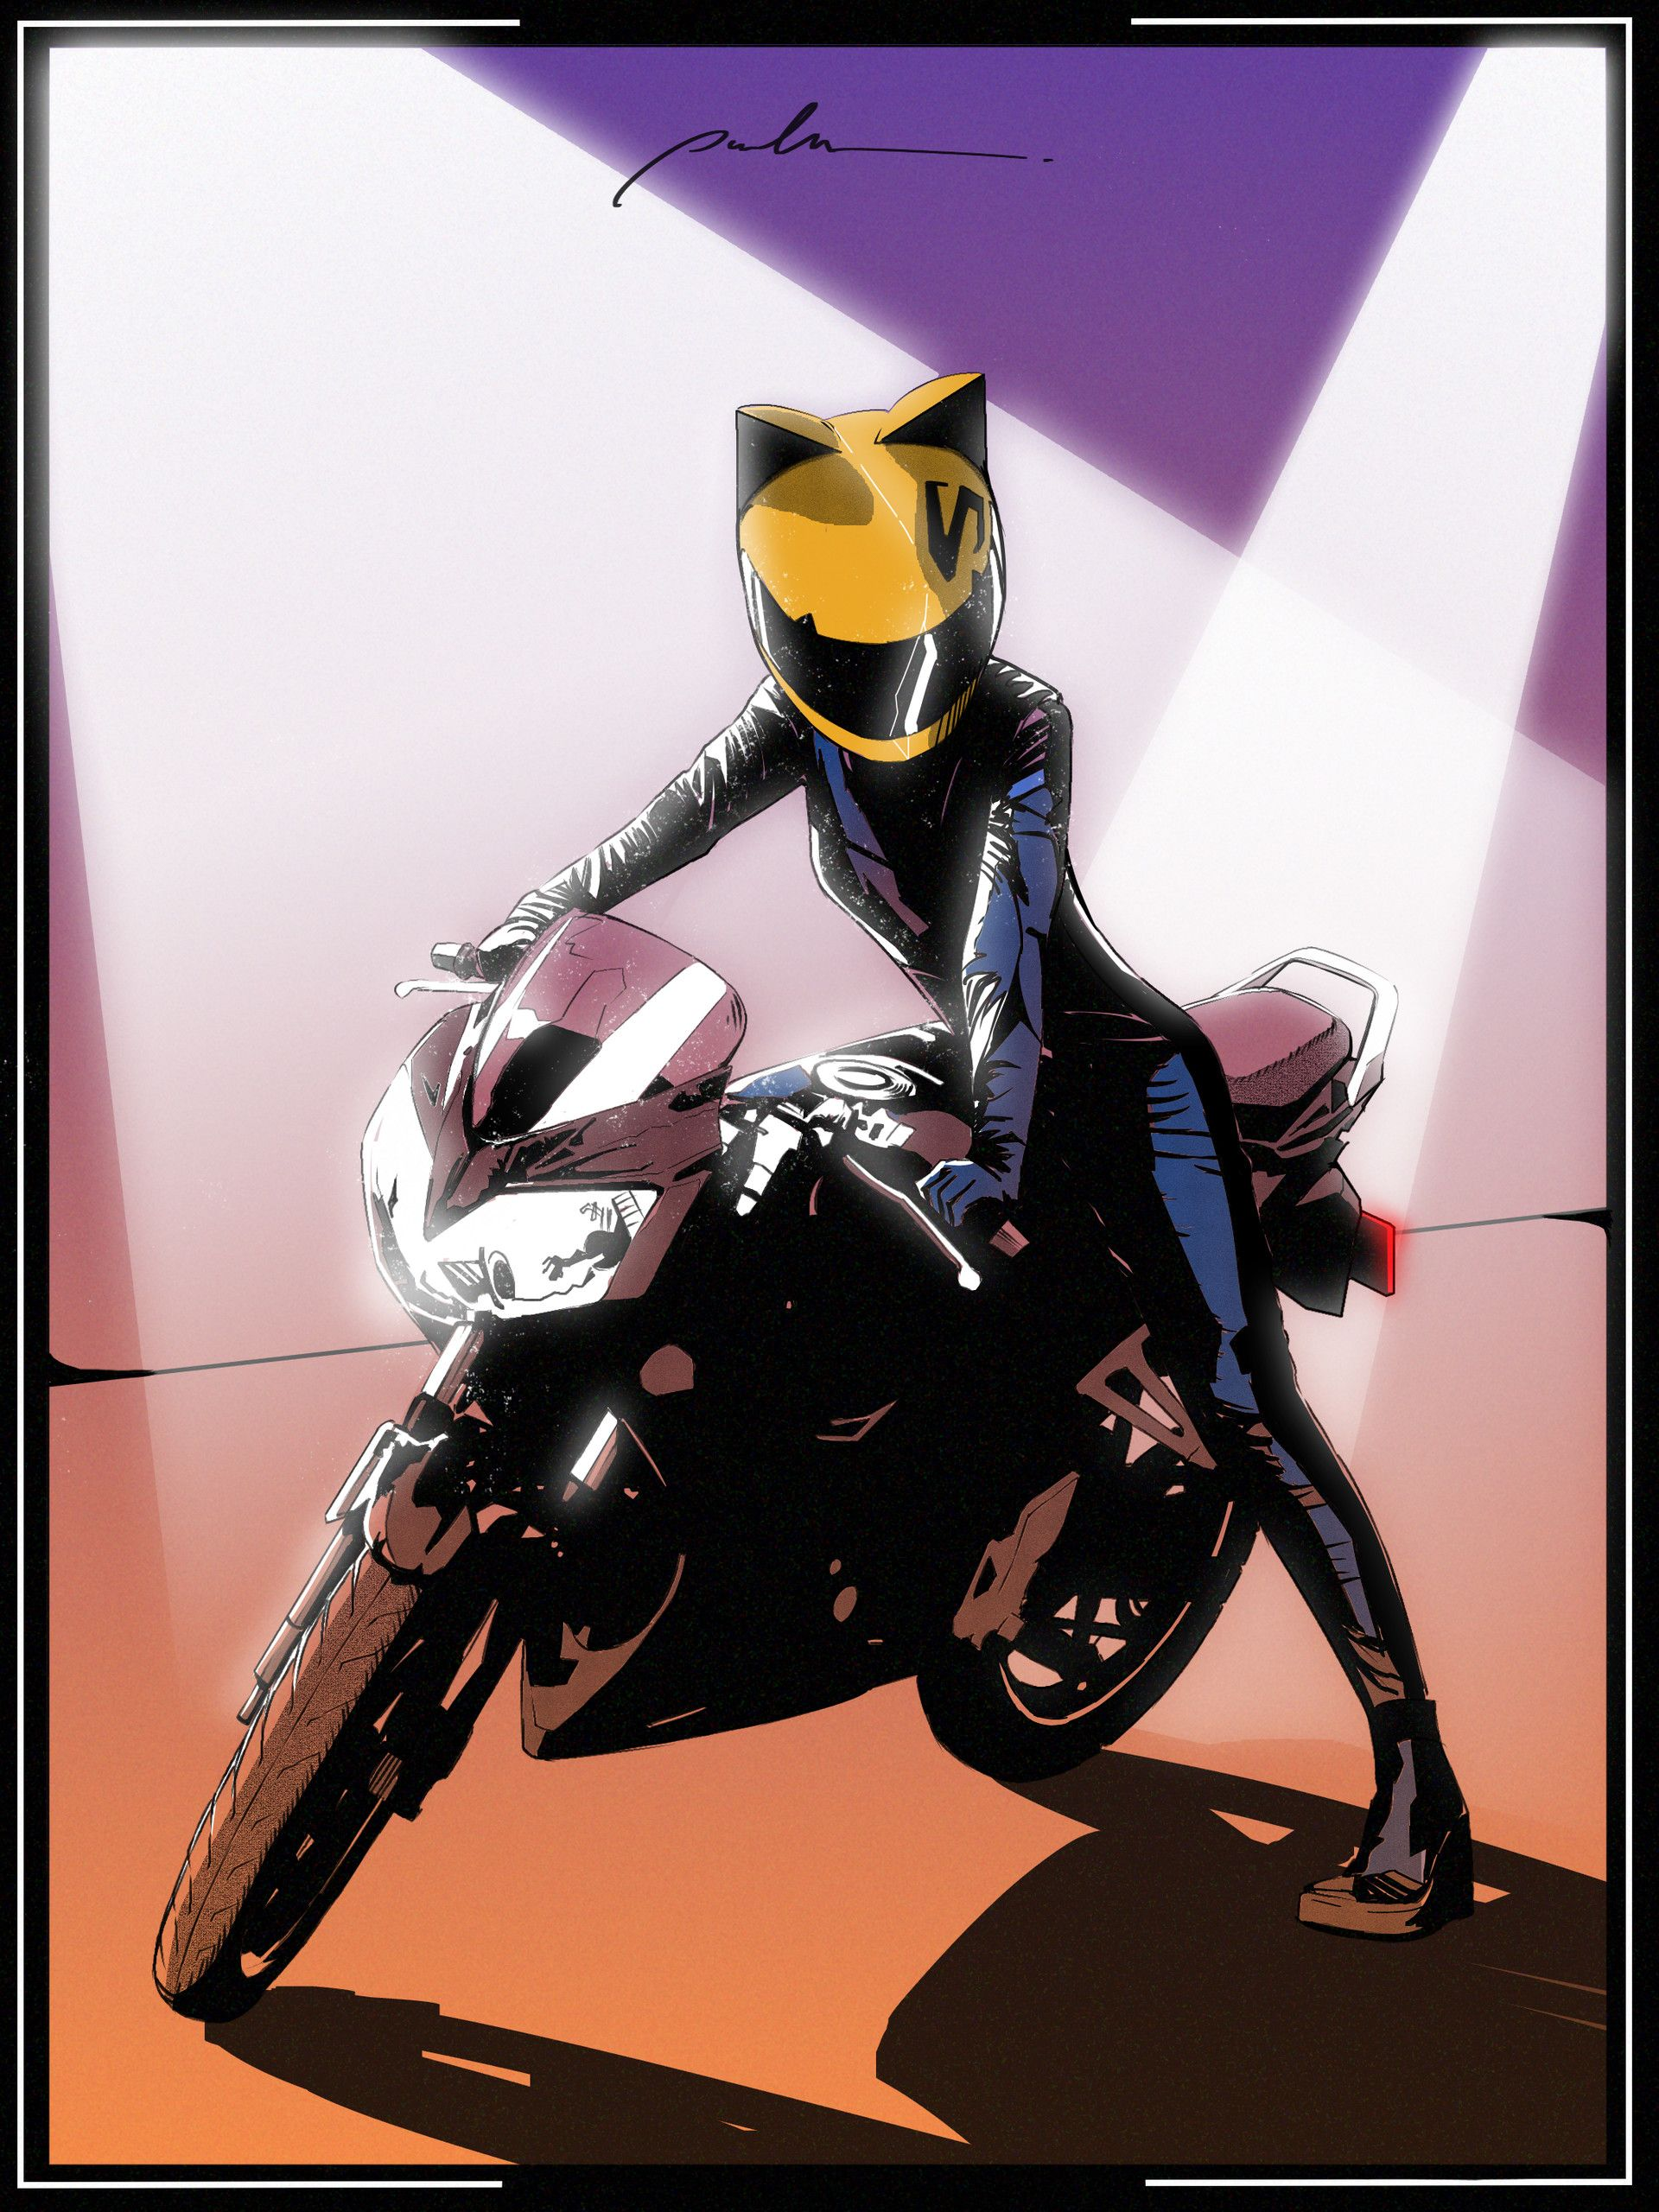 Anime Art Anime Motorcycle Motorcycle Drawing Motorbike Art